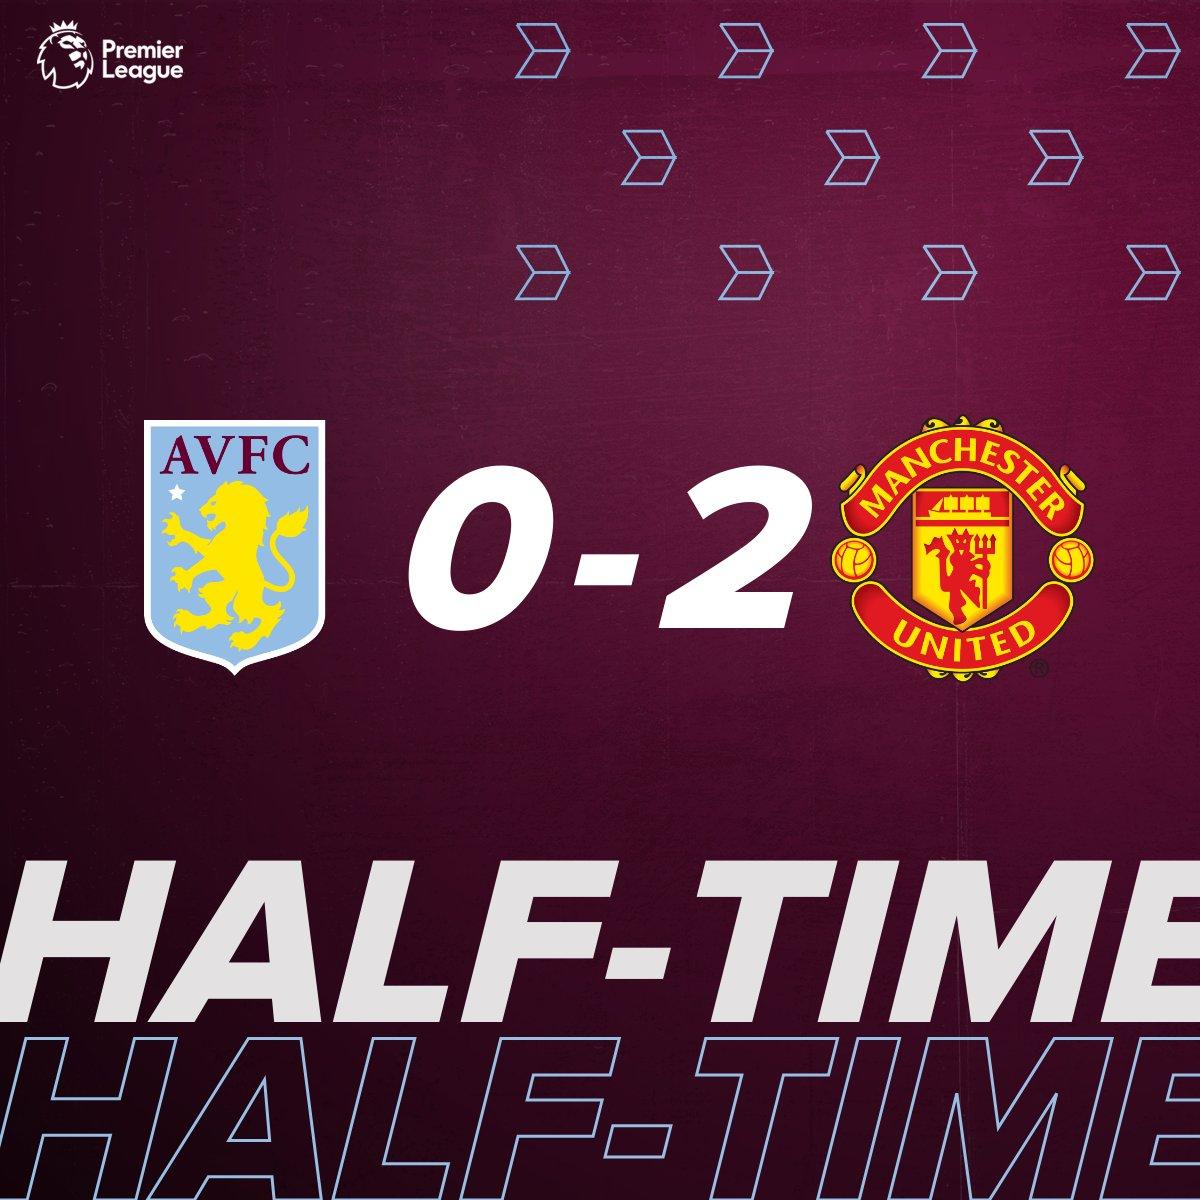 Half-time at Villa Park.  #AVLMUN #AVFC https://t.co/cKoBZTniE7